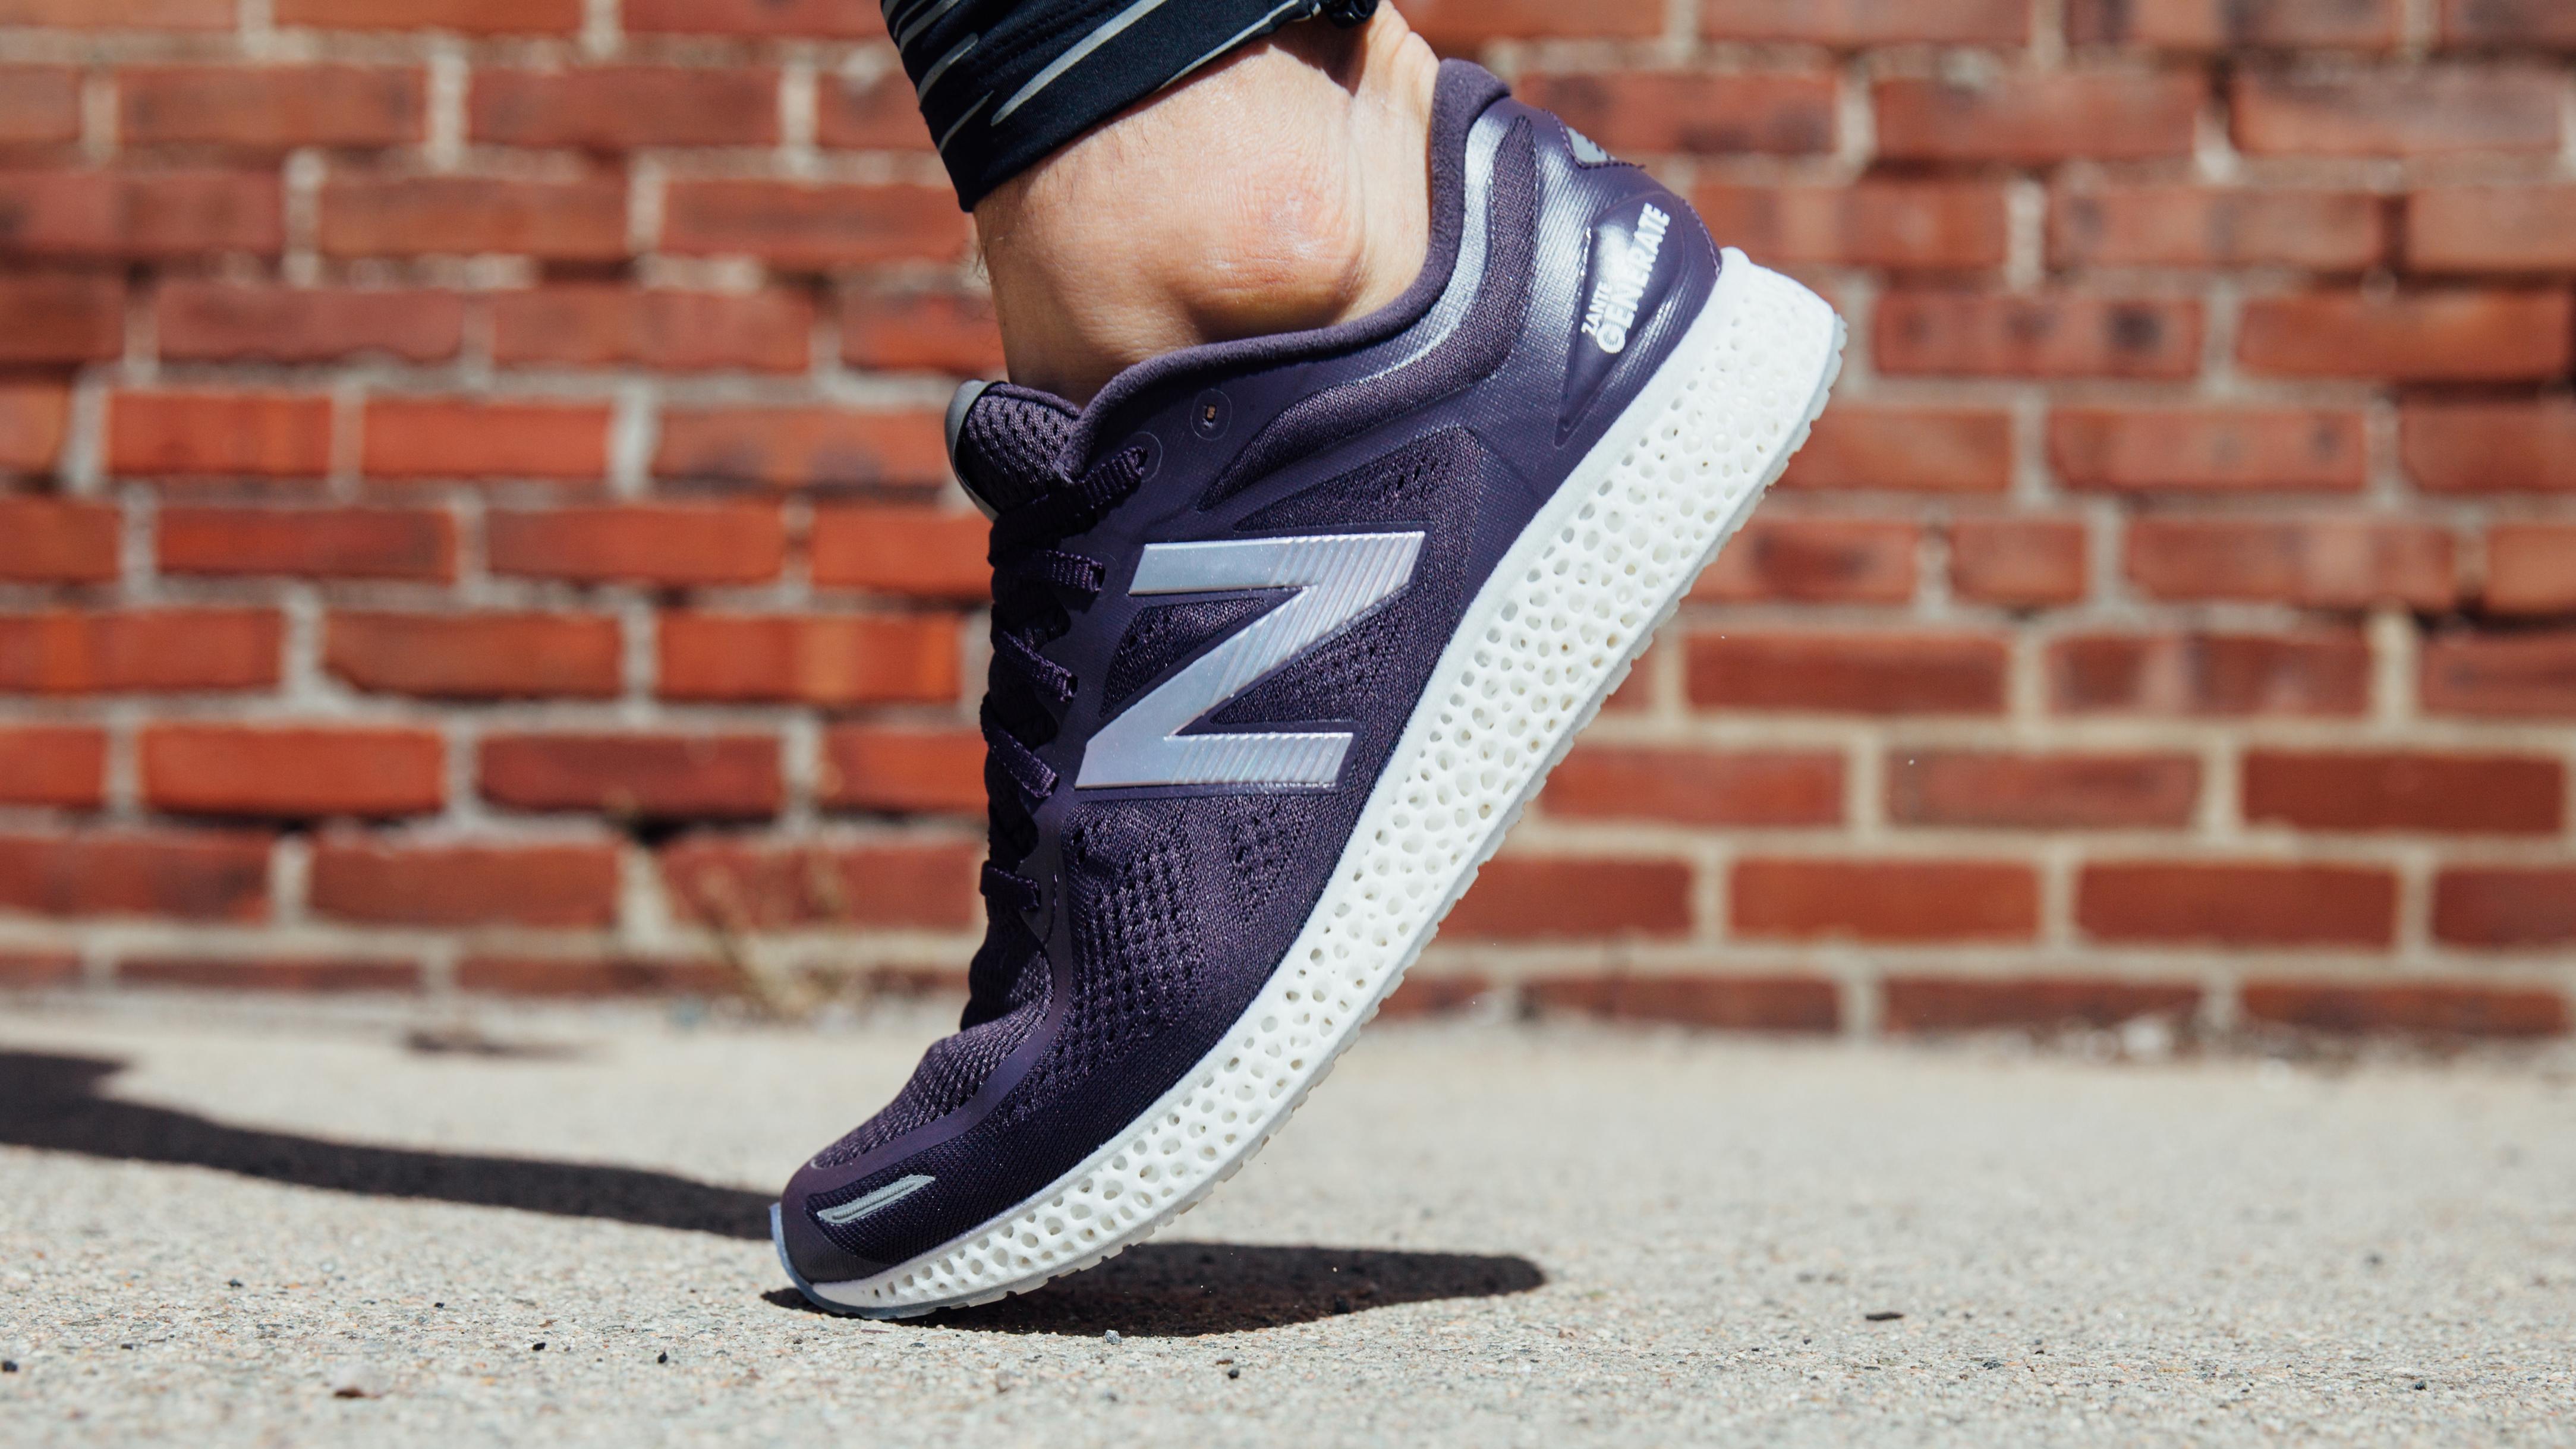 New Balance makes historic footwear